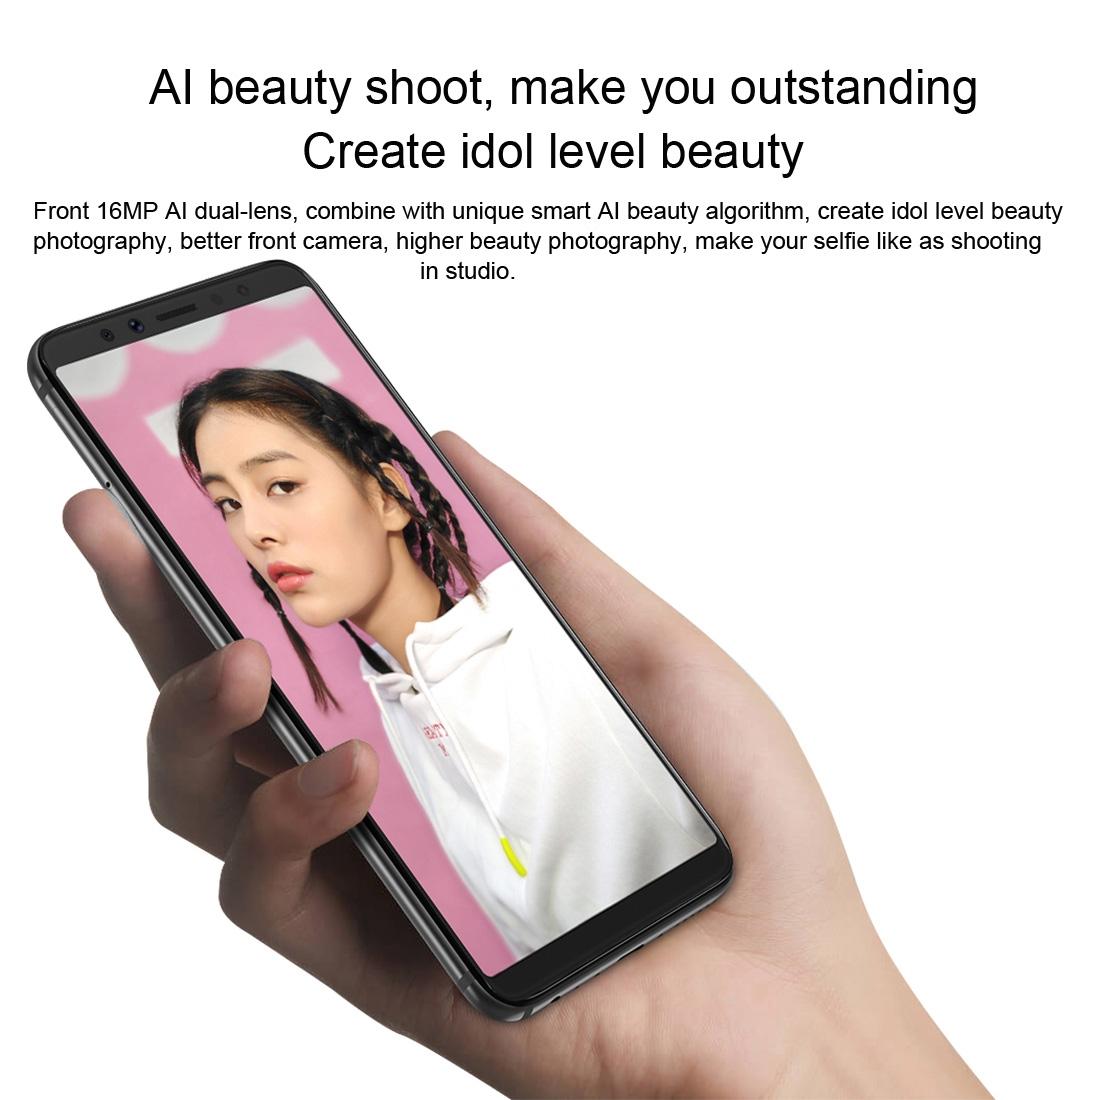 i.ibb.co/ggS3Q3h/Smartphone-6-GB-64-GB-Lenovo-K5-Pro-Preto-8.jpg